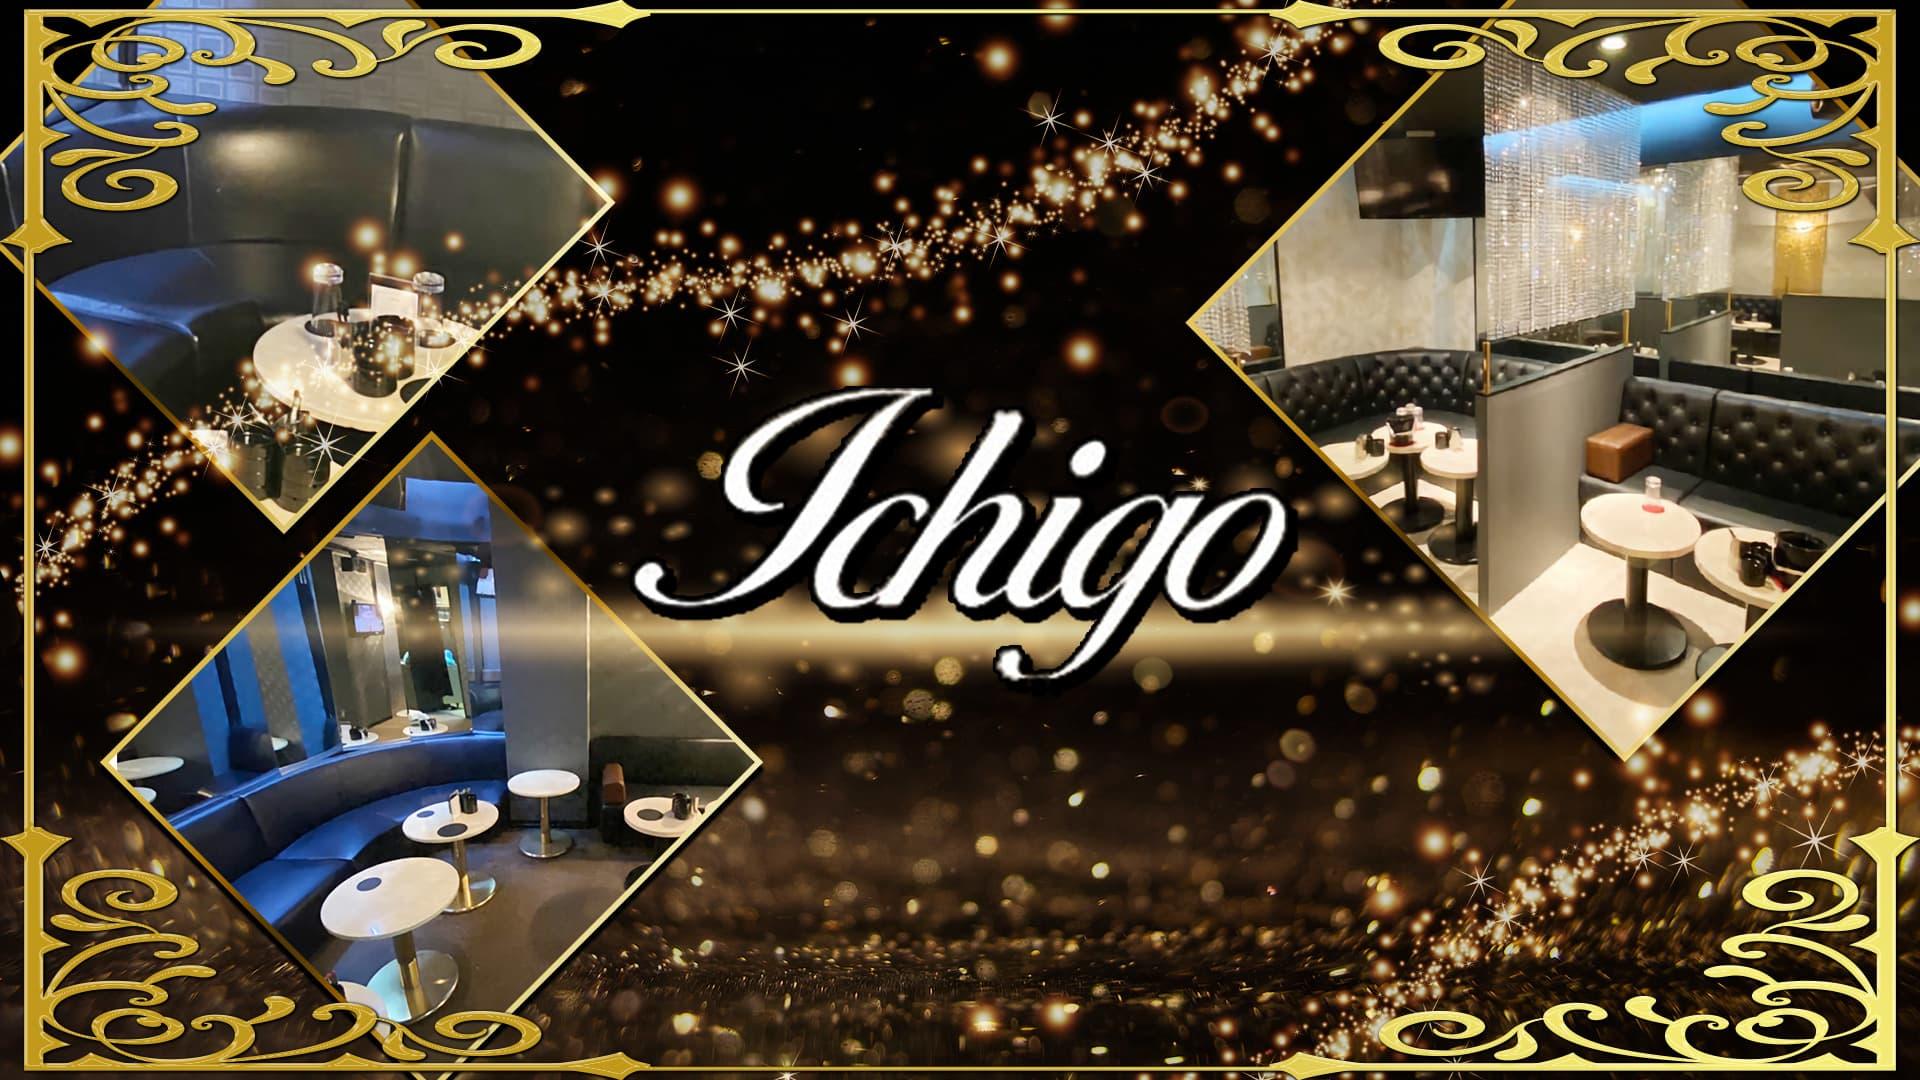 Ichigo(イチゴ)【公式求人・体入情報】 歌舞伎町キャバクラ TOP画像